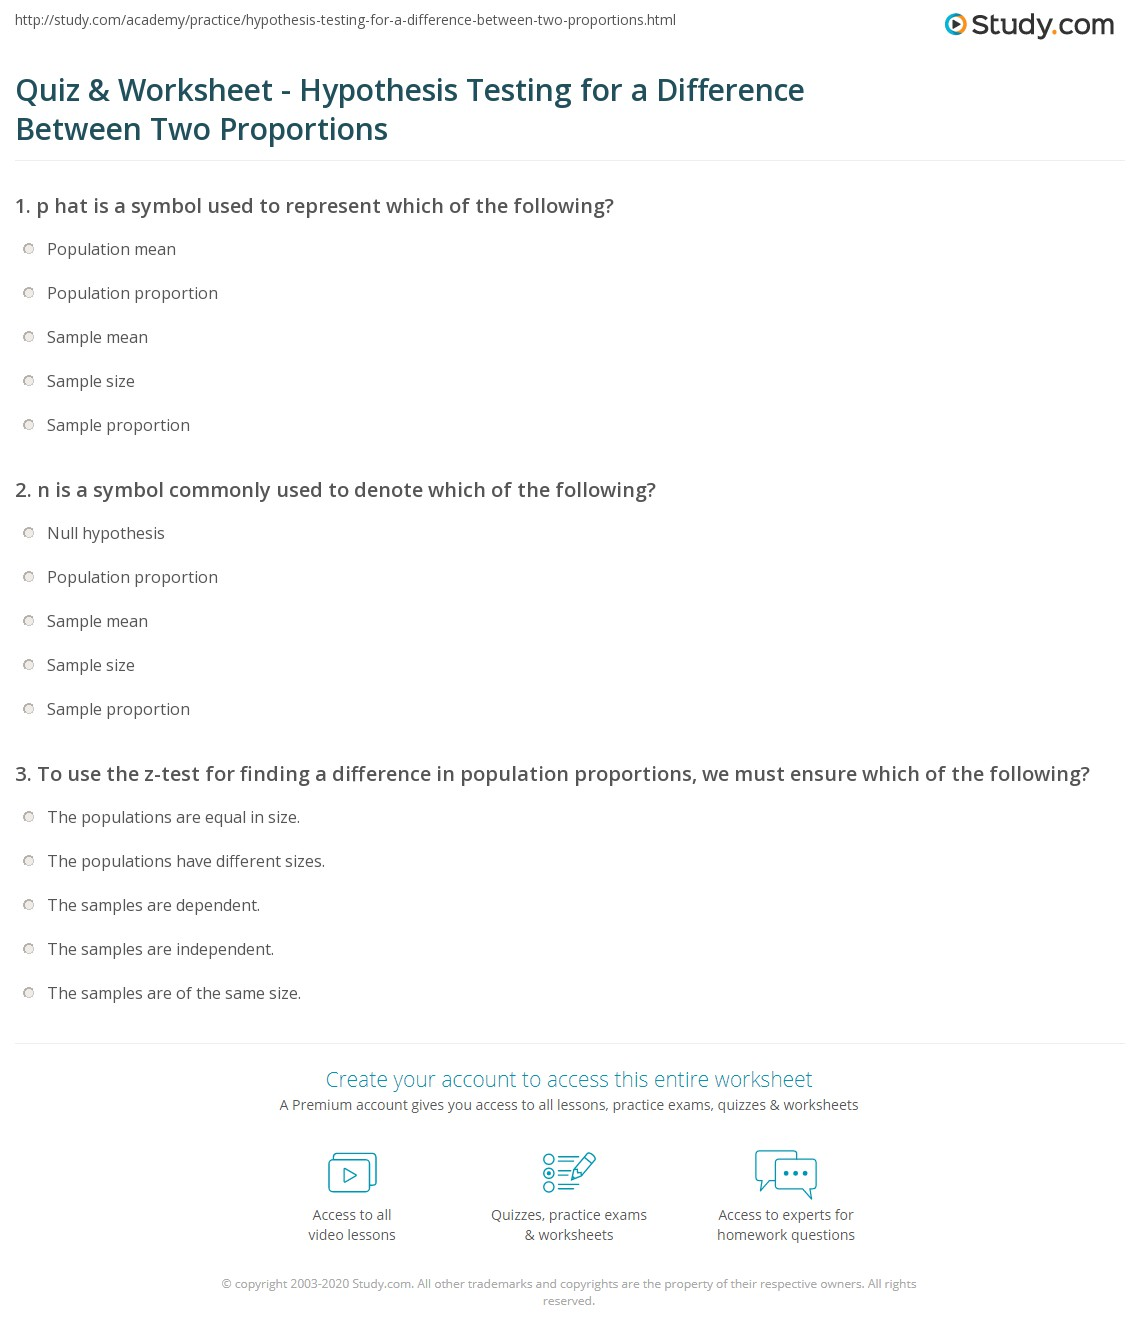 Worksheet For Hypothesis Testing